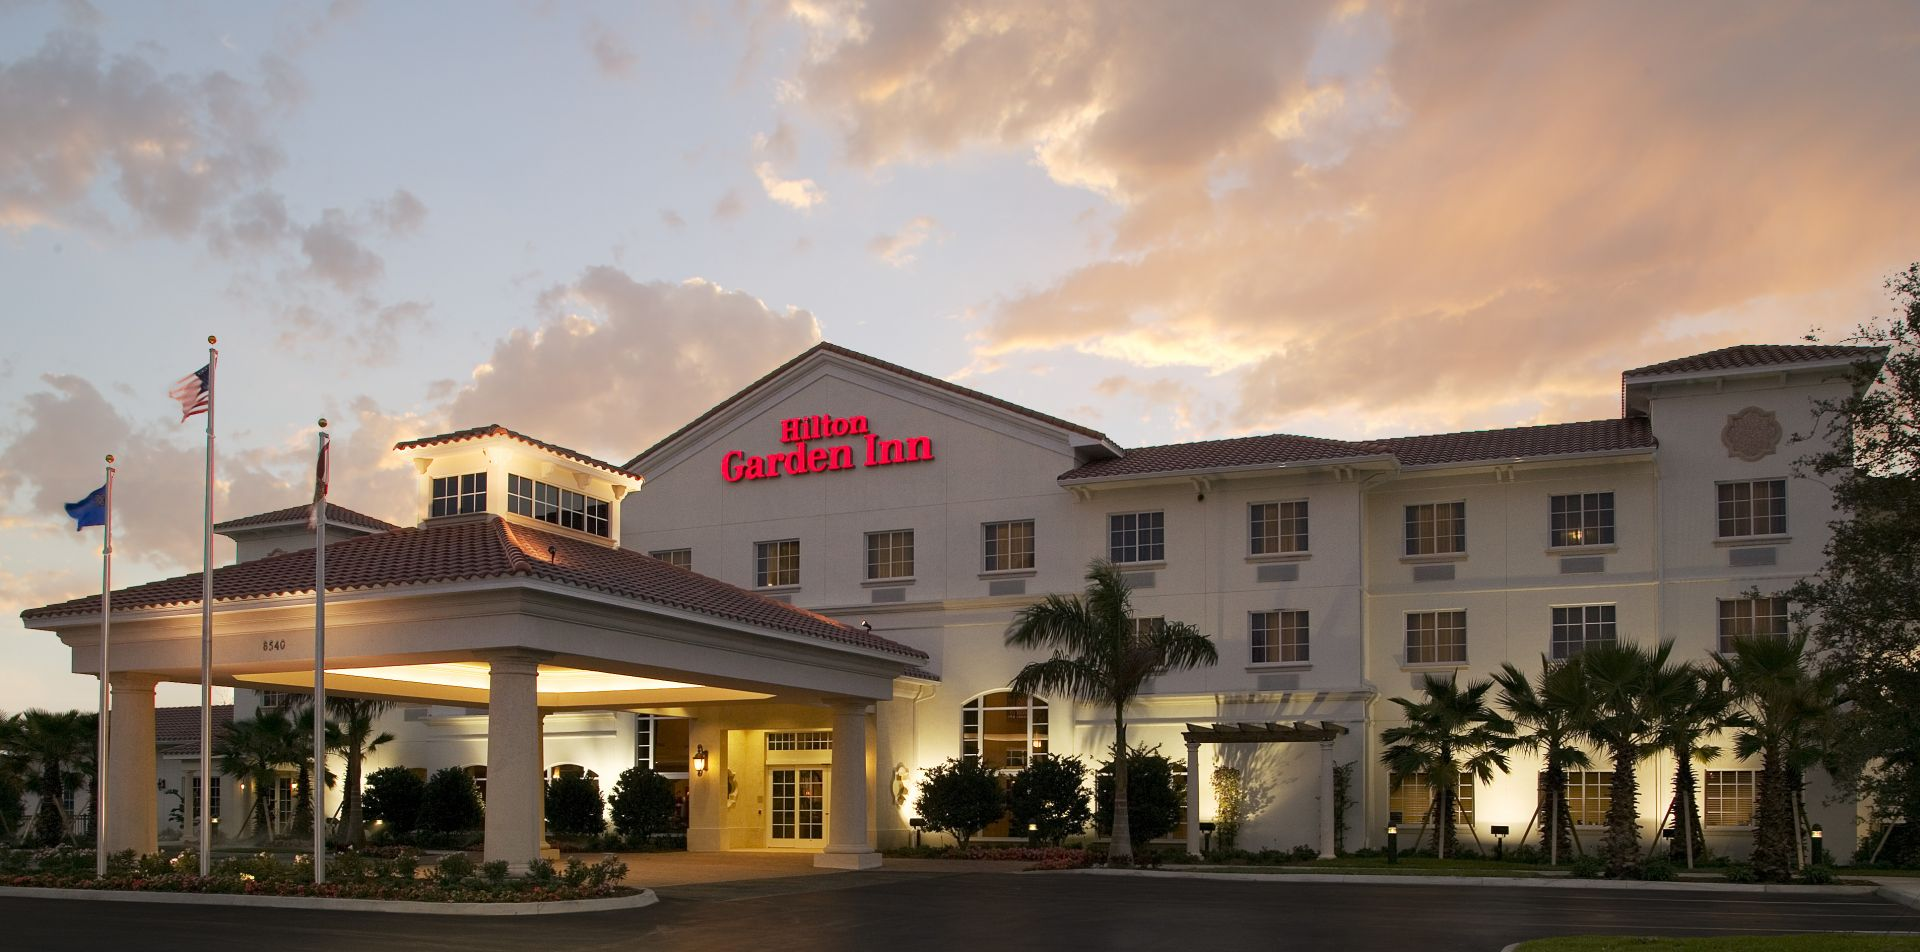 Hilton Garden Inn Port St Lucie FL Official Hotel Site